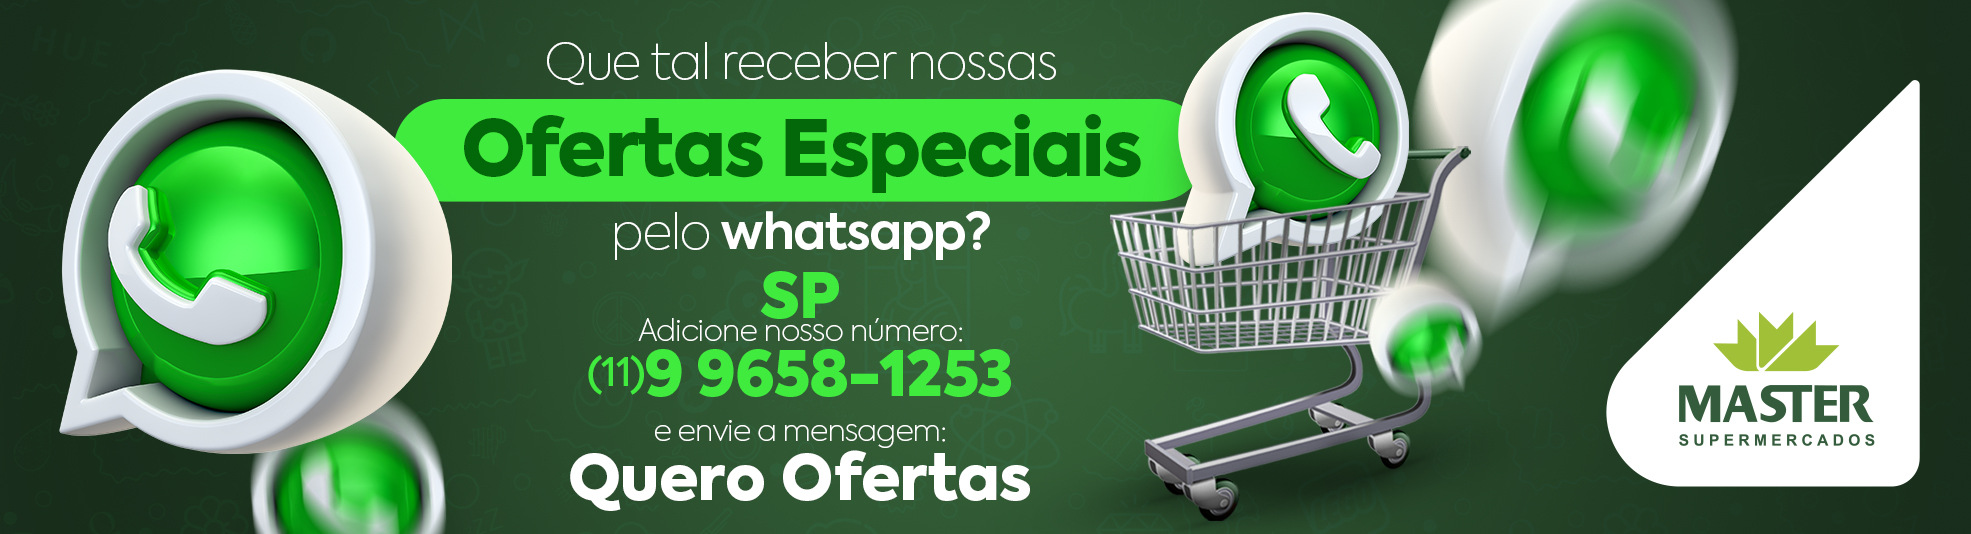 Campanha whats Master SP